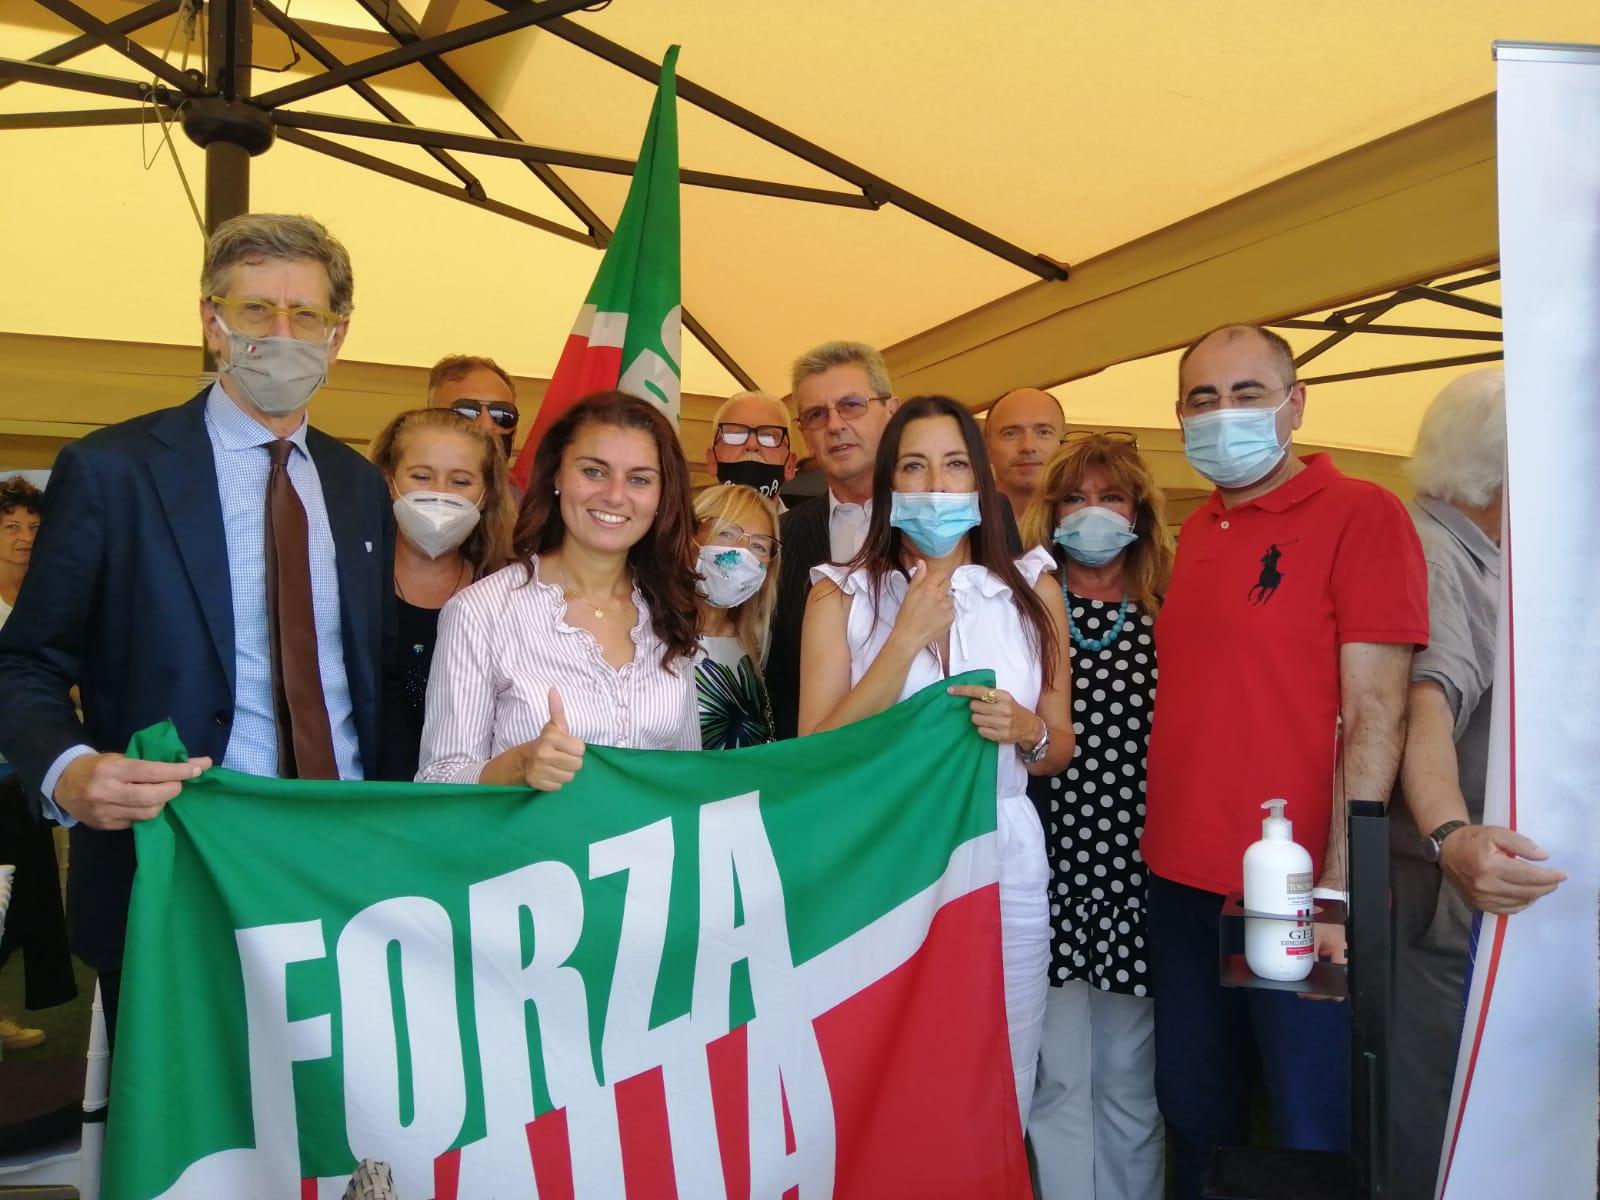 Coordinamento regionale a porte aperte a Firenze 24